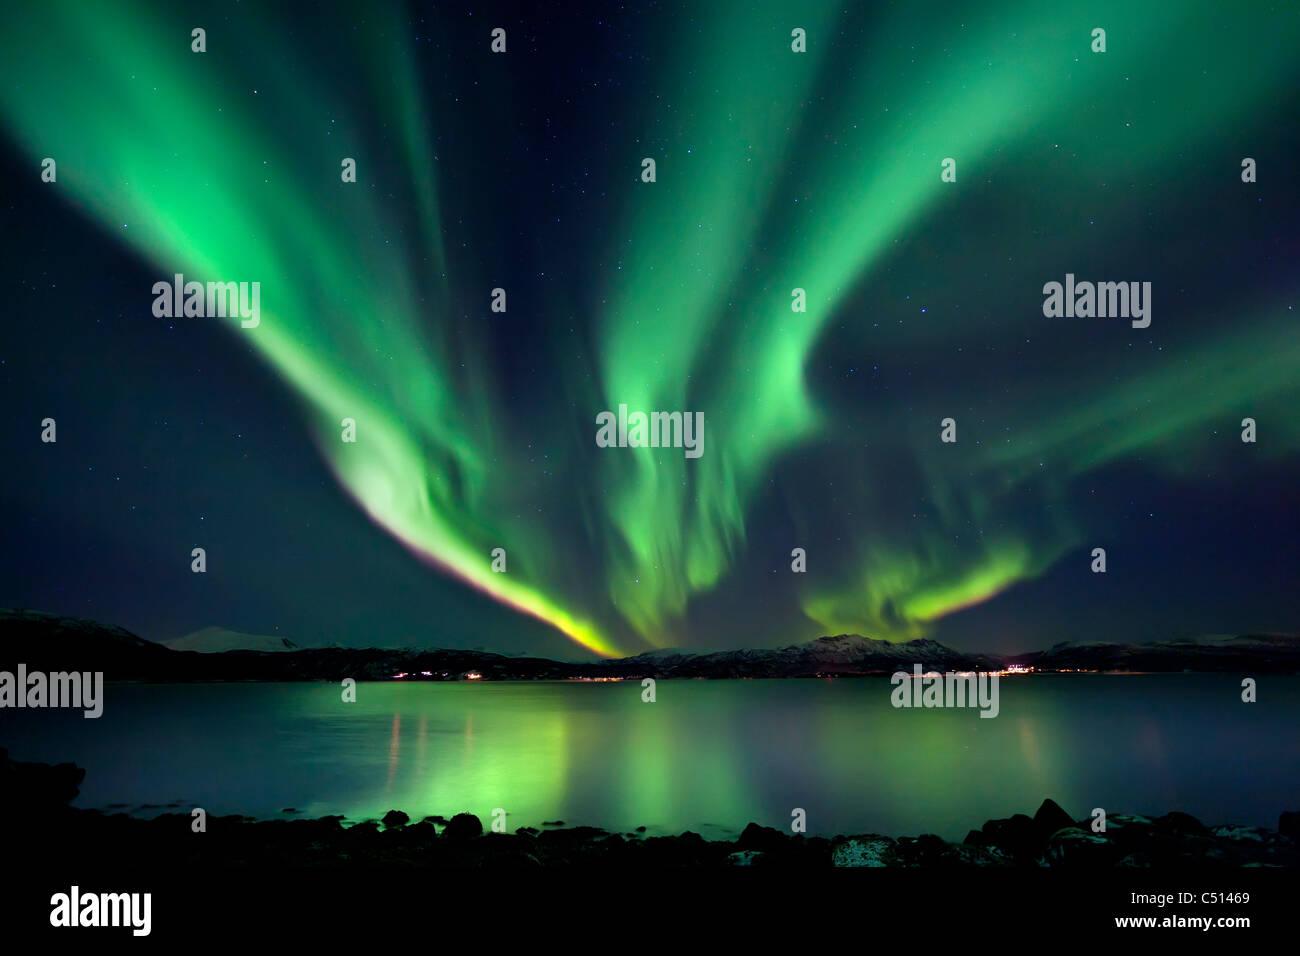 Aurora Borealis over Tjeldsundet in Troms County, Norway. - Stock Image